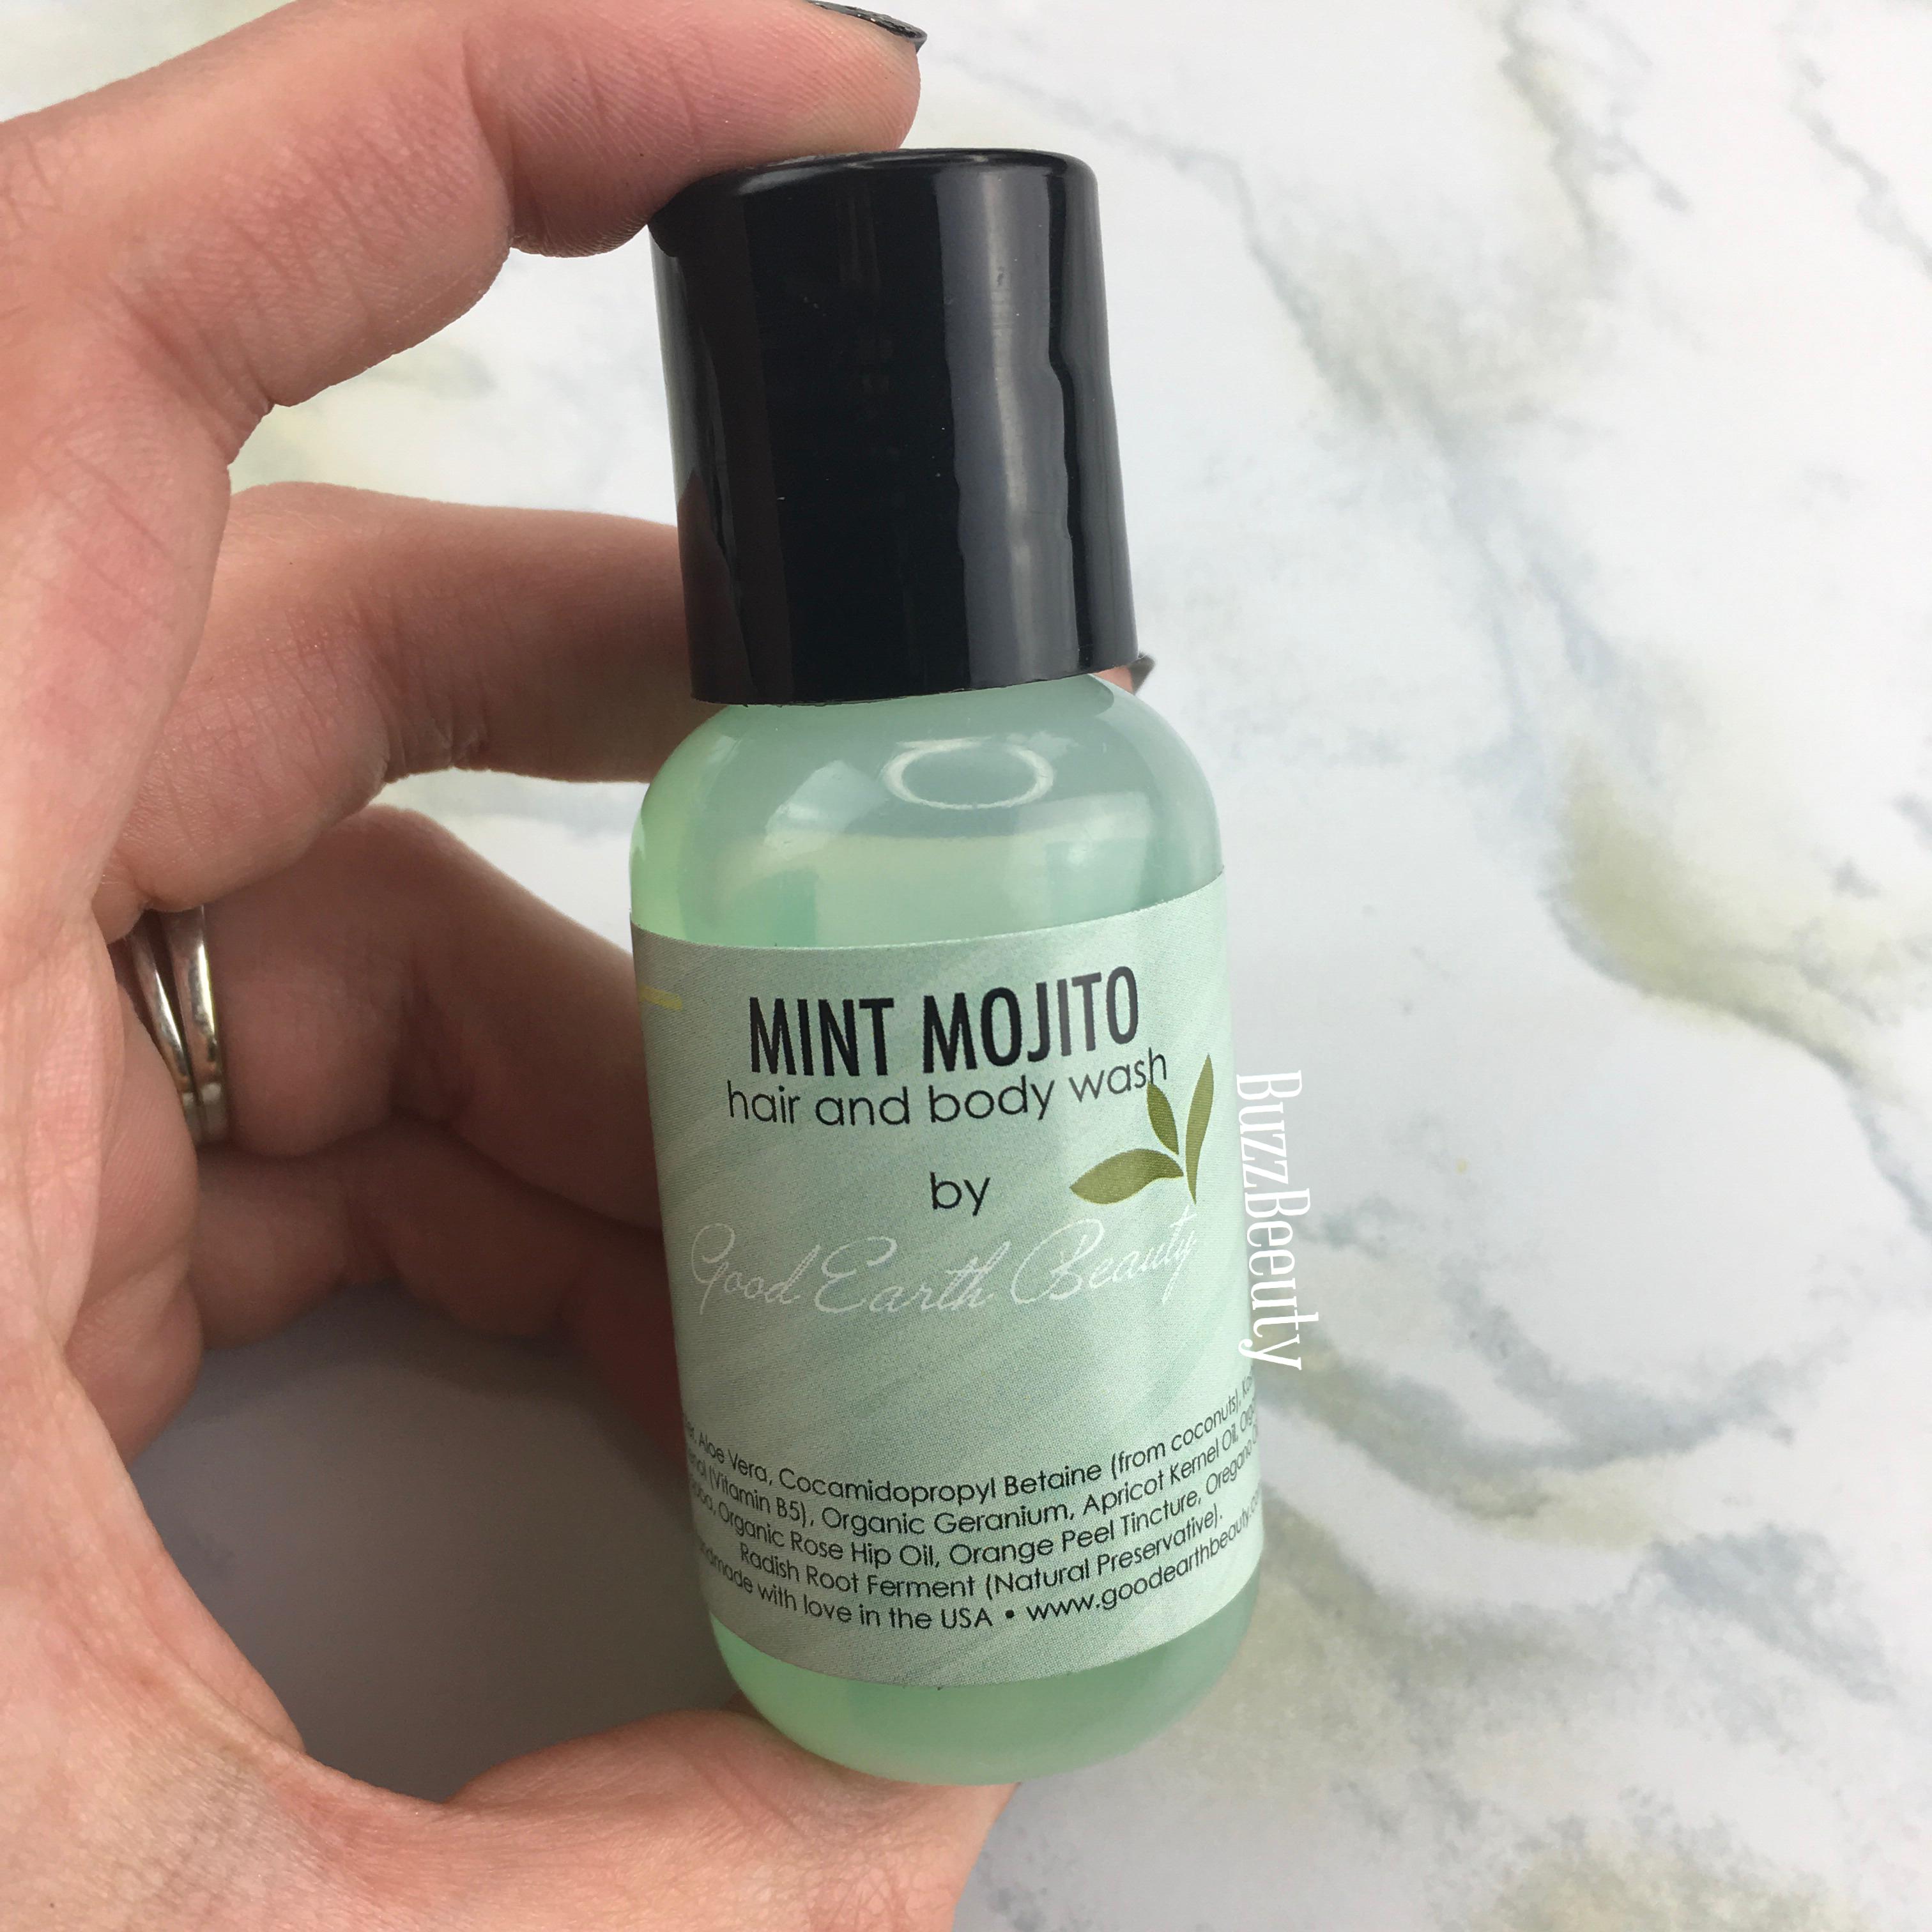 Good Earth Beauty Mint Mojito Shampoo and Body Wash